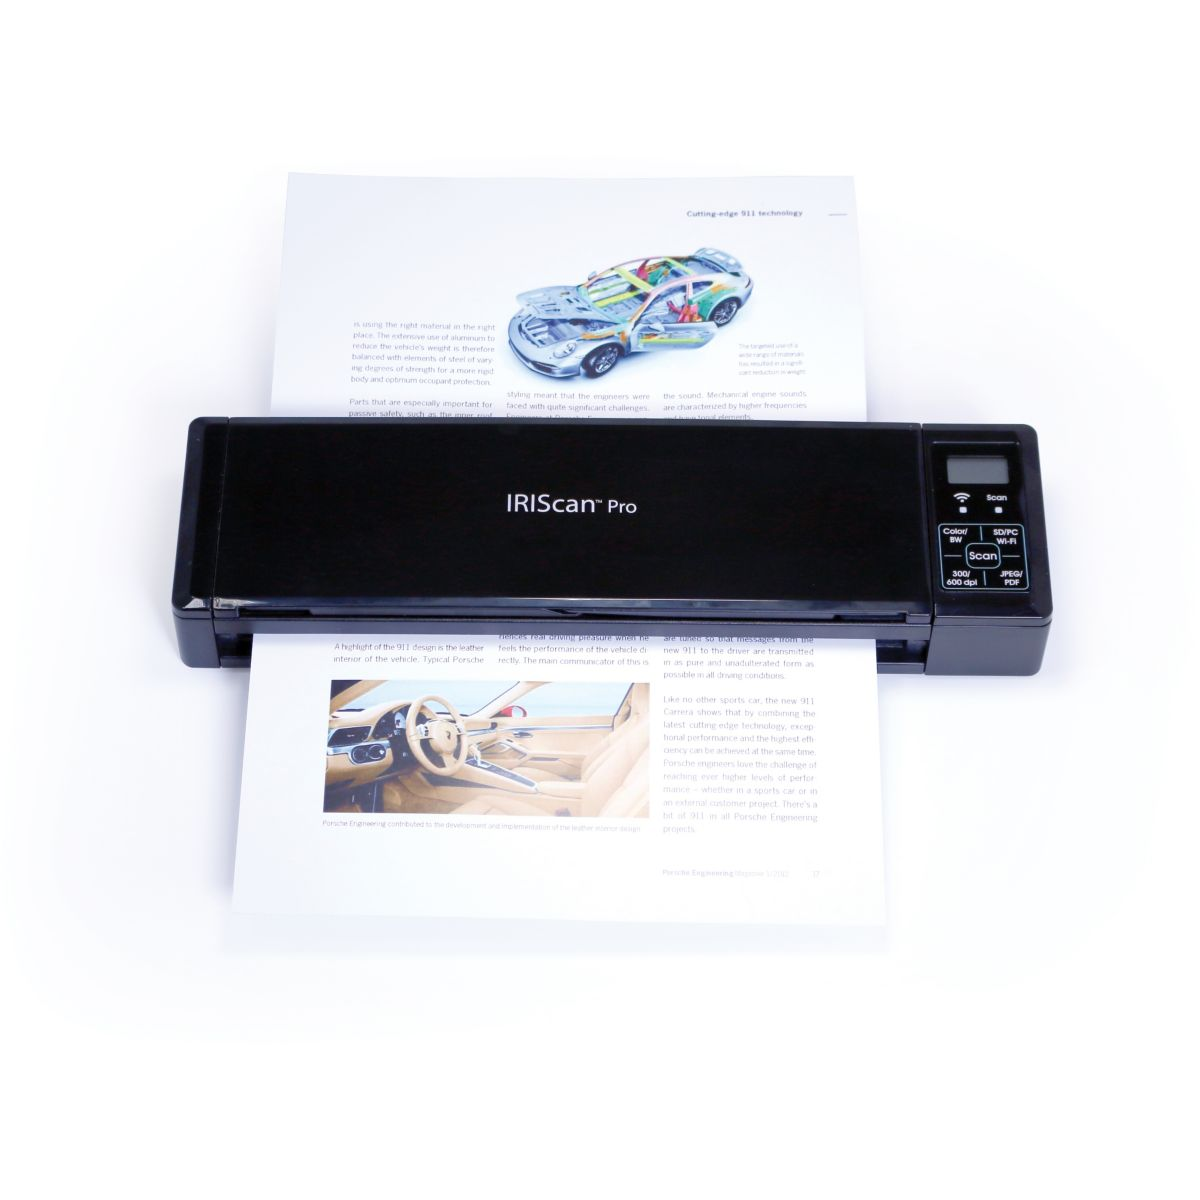 Scanner portable iris iriscan pro 3 wifi - livraison offerte : code premium